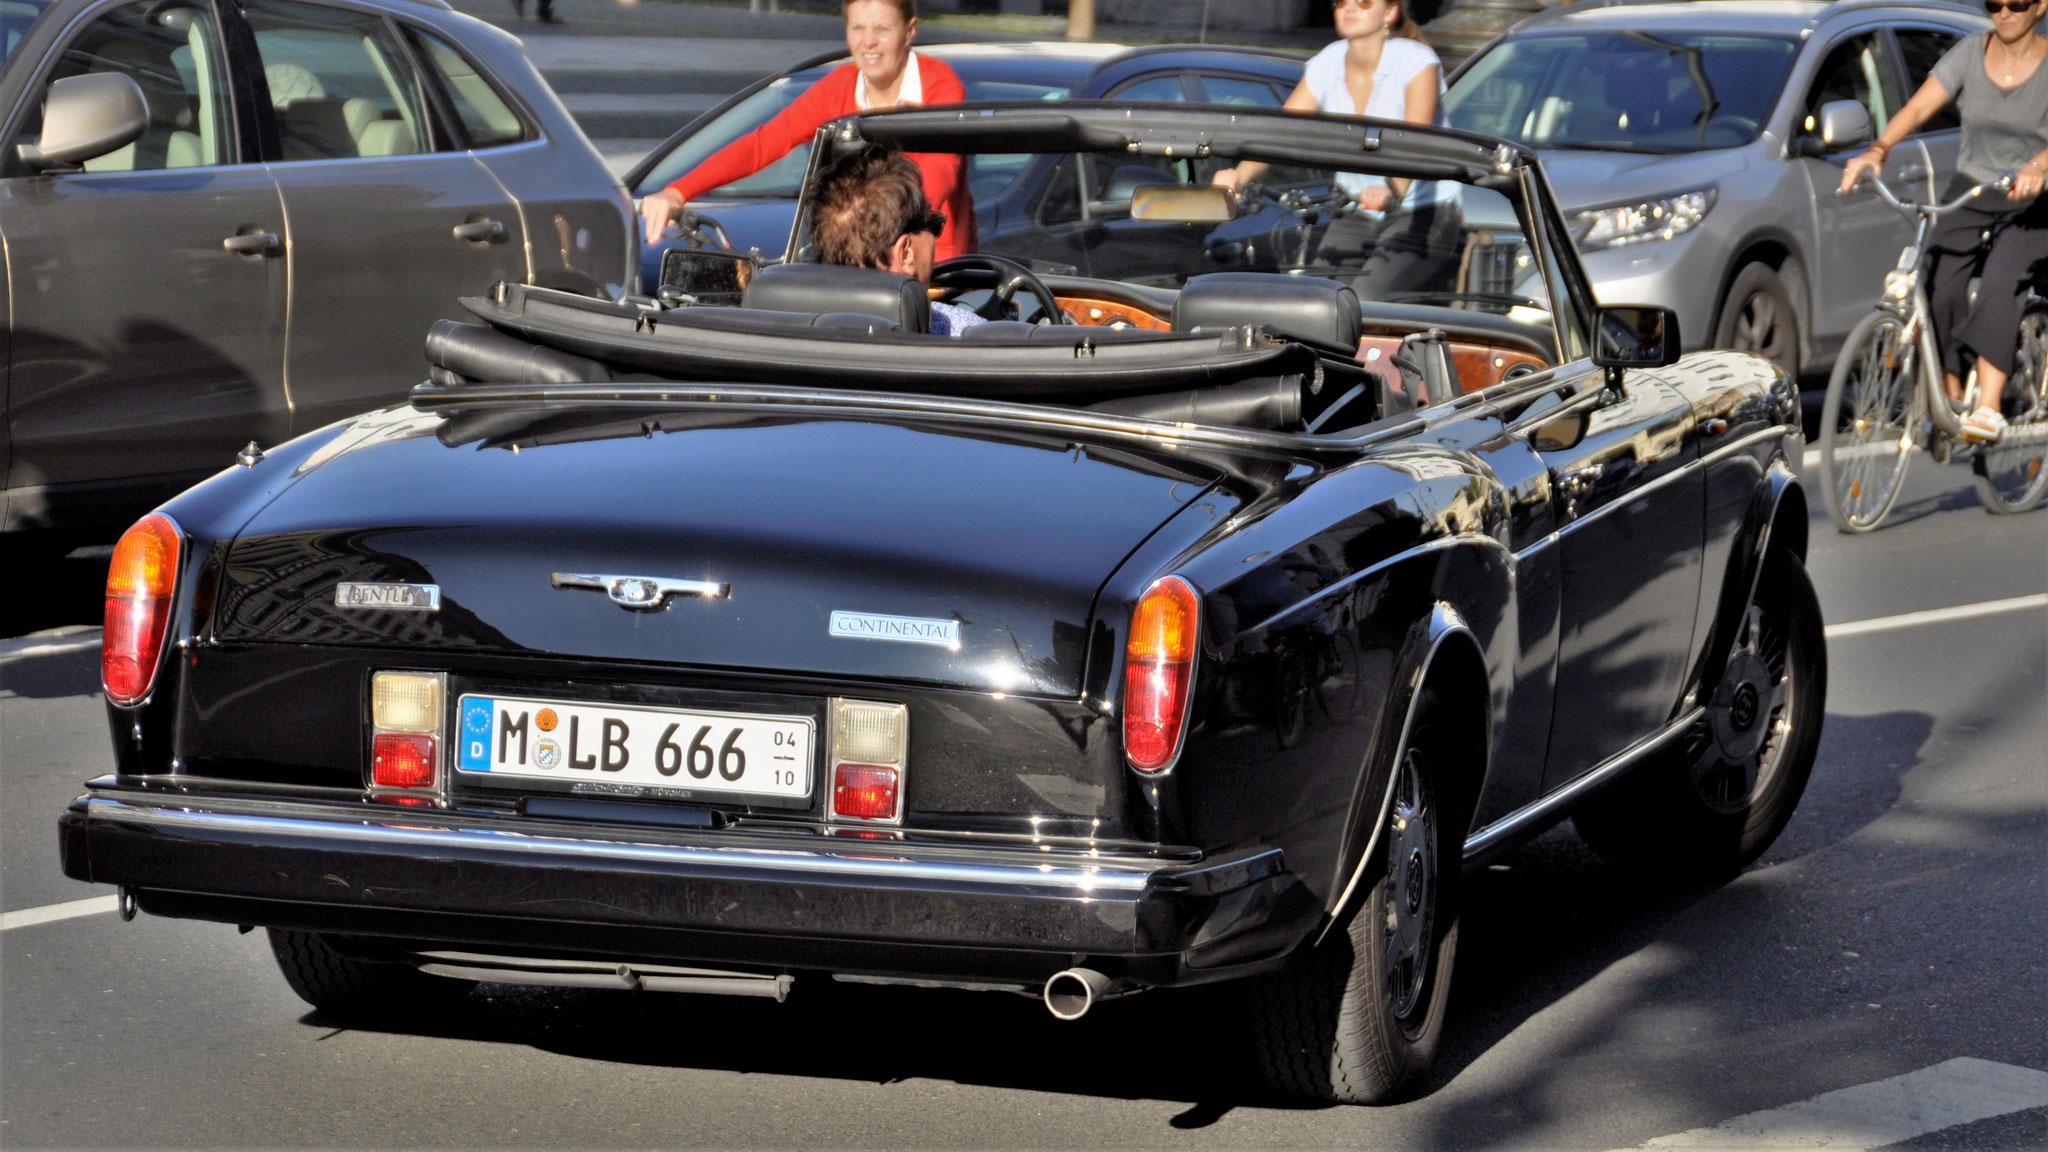 Cabriolet - M-LB-666